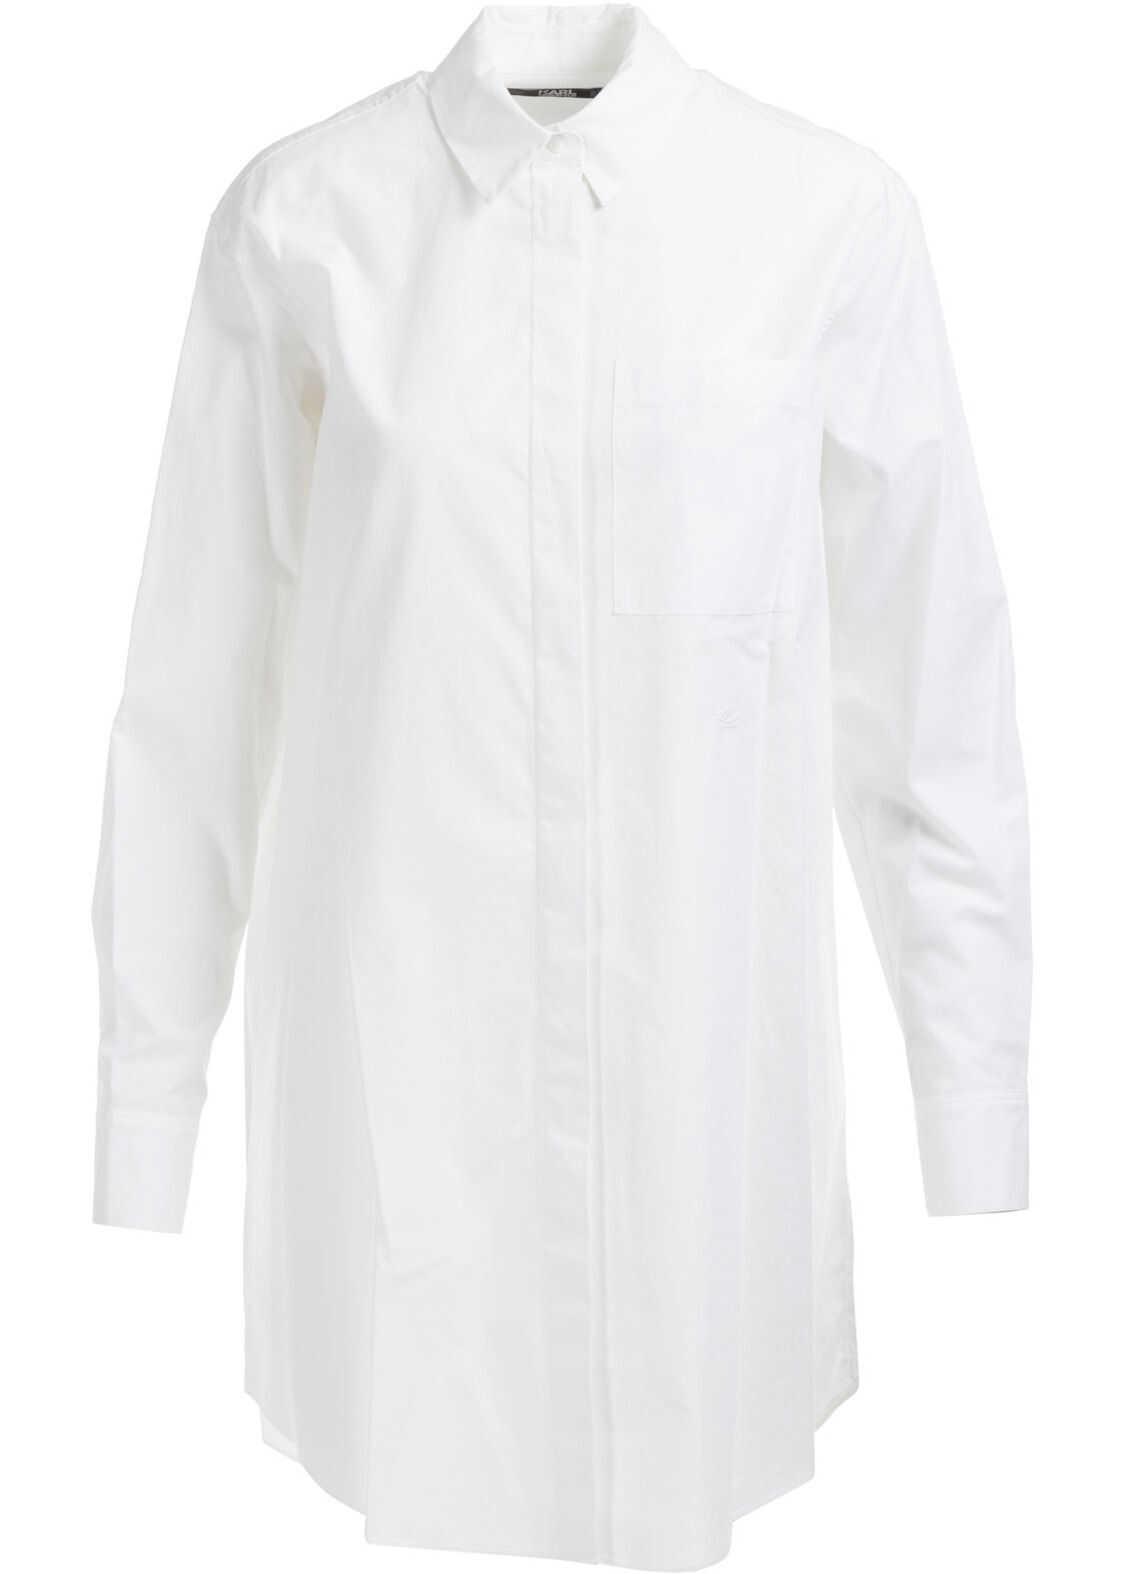 Karl Lagerfeld Long Sleeve White